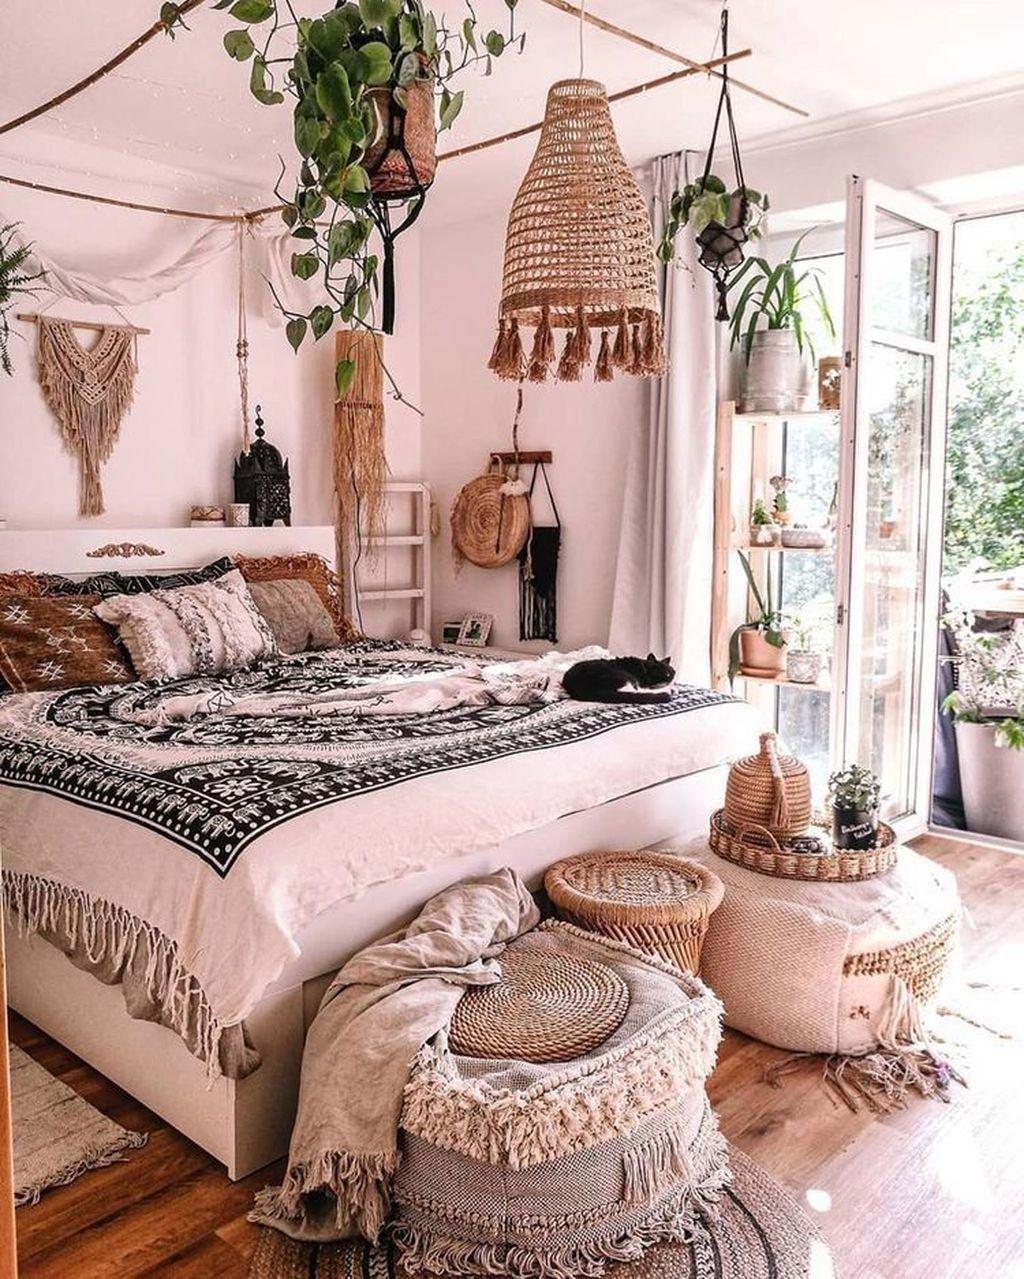 Fabulous Diy Bedroom Decor Ideas To Inspire You 31